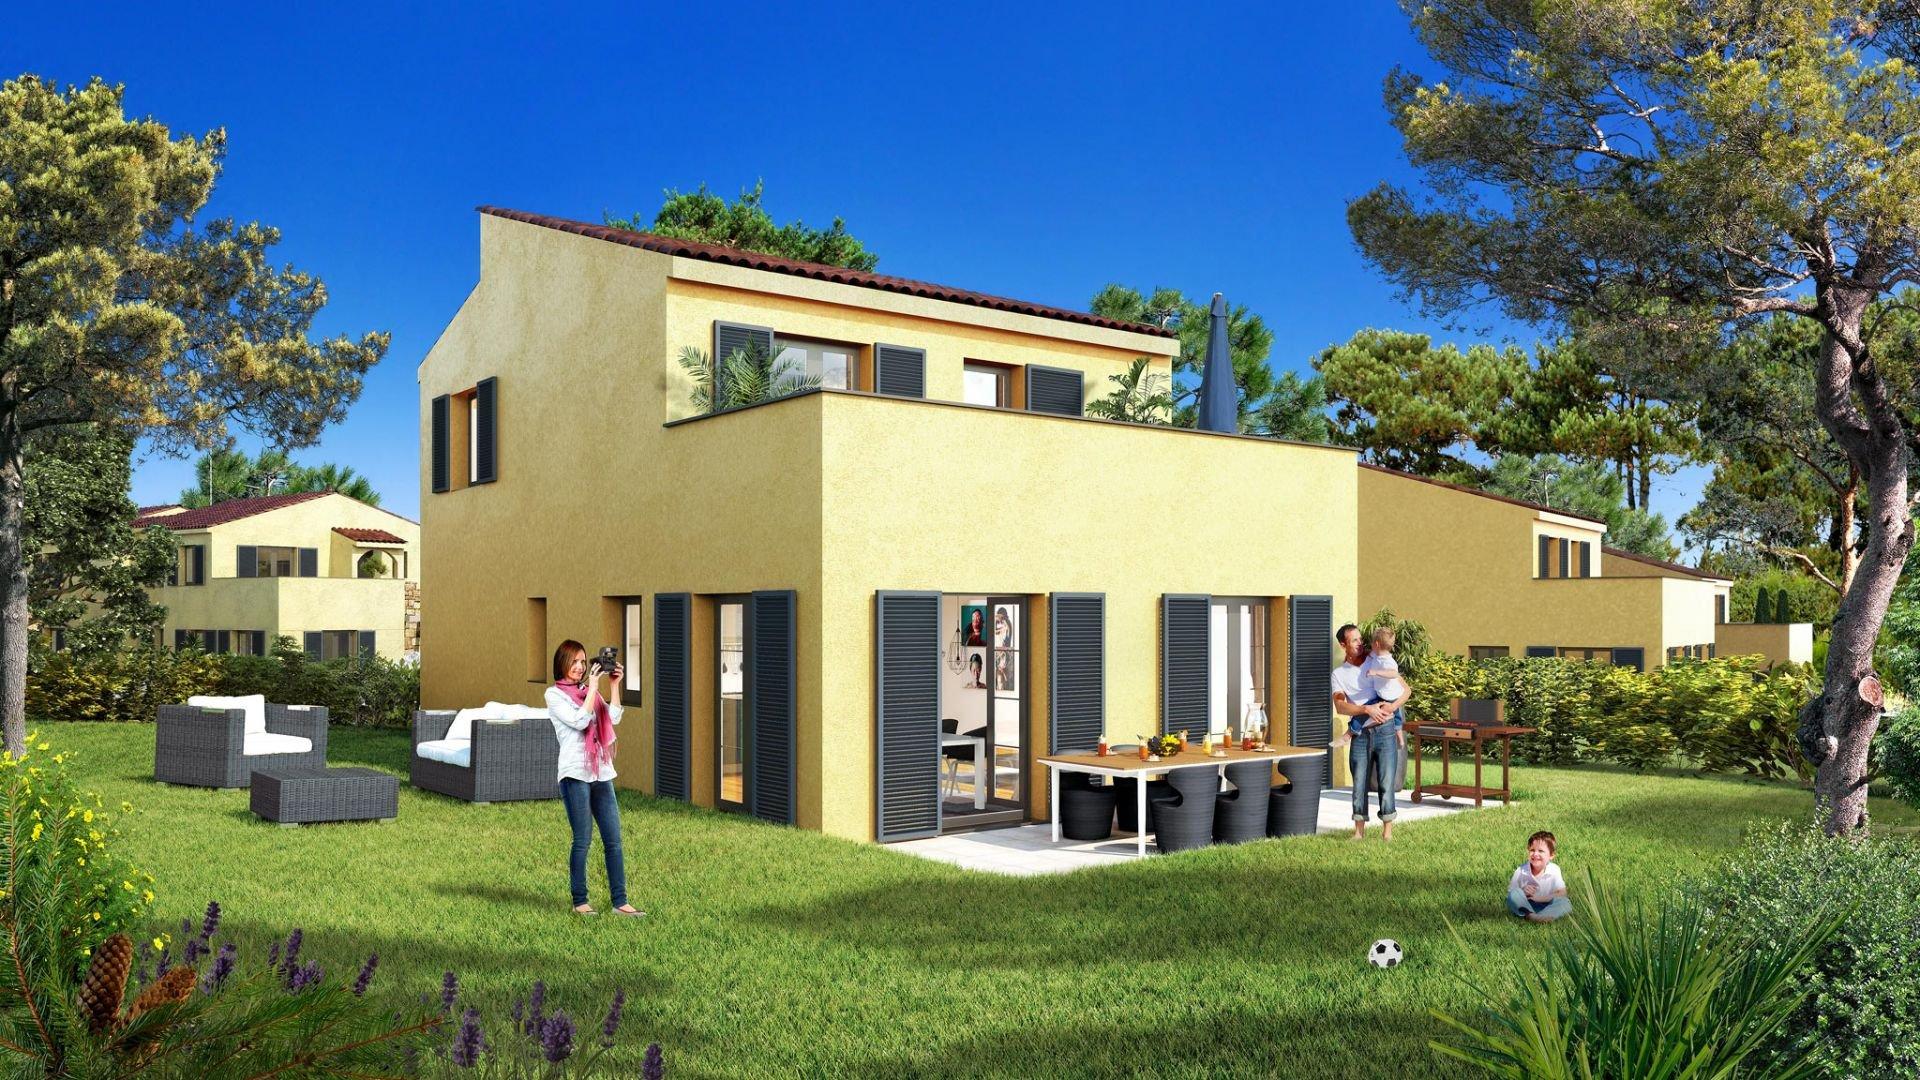 Appartement 3 pièces - Résidence neuve - Calenzana